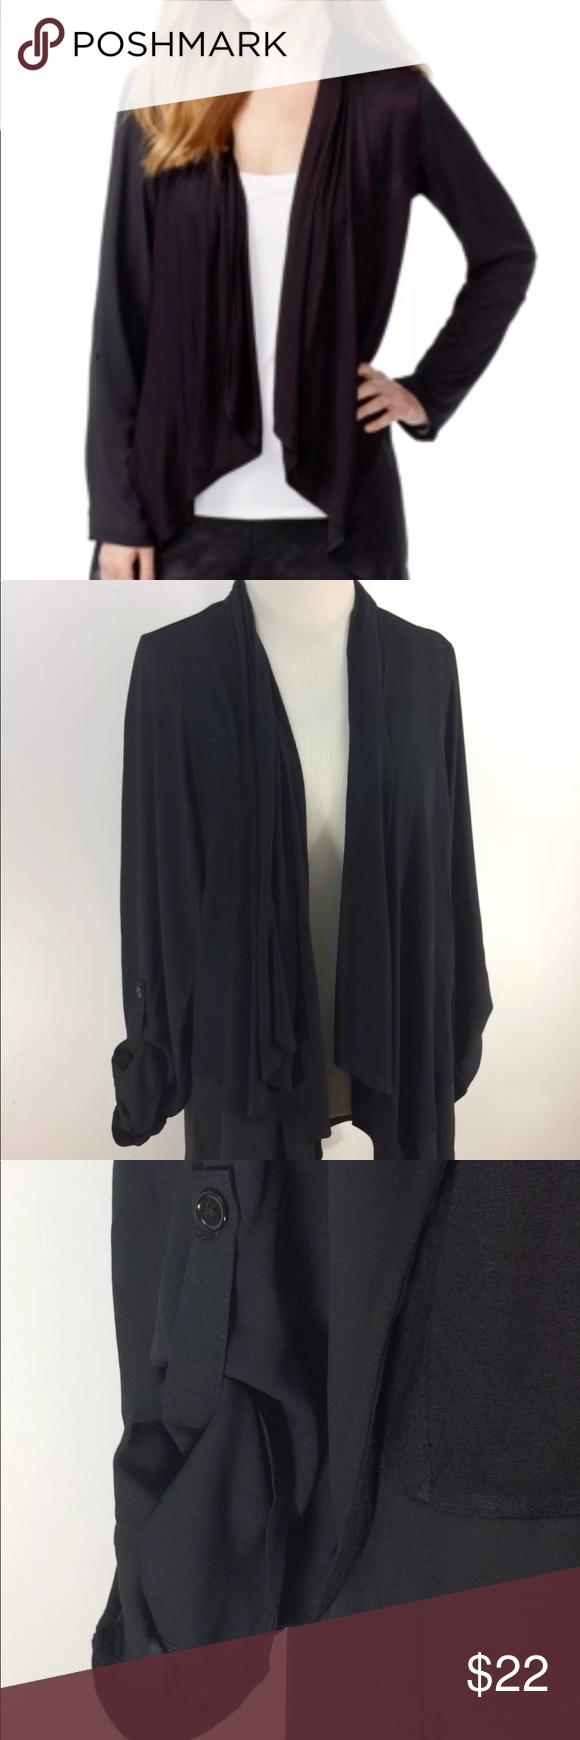 Inc Tab-Sleeve Knit Cardigan Black Size XL Inc International